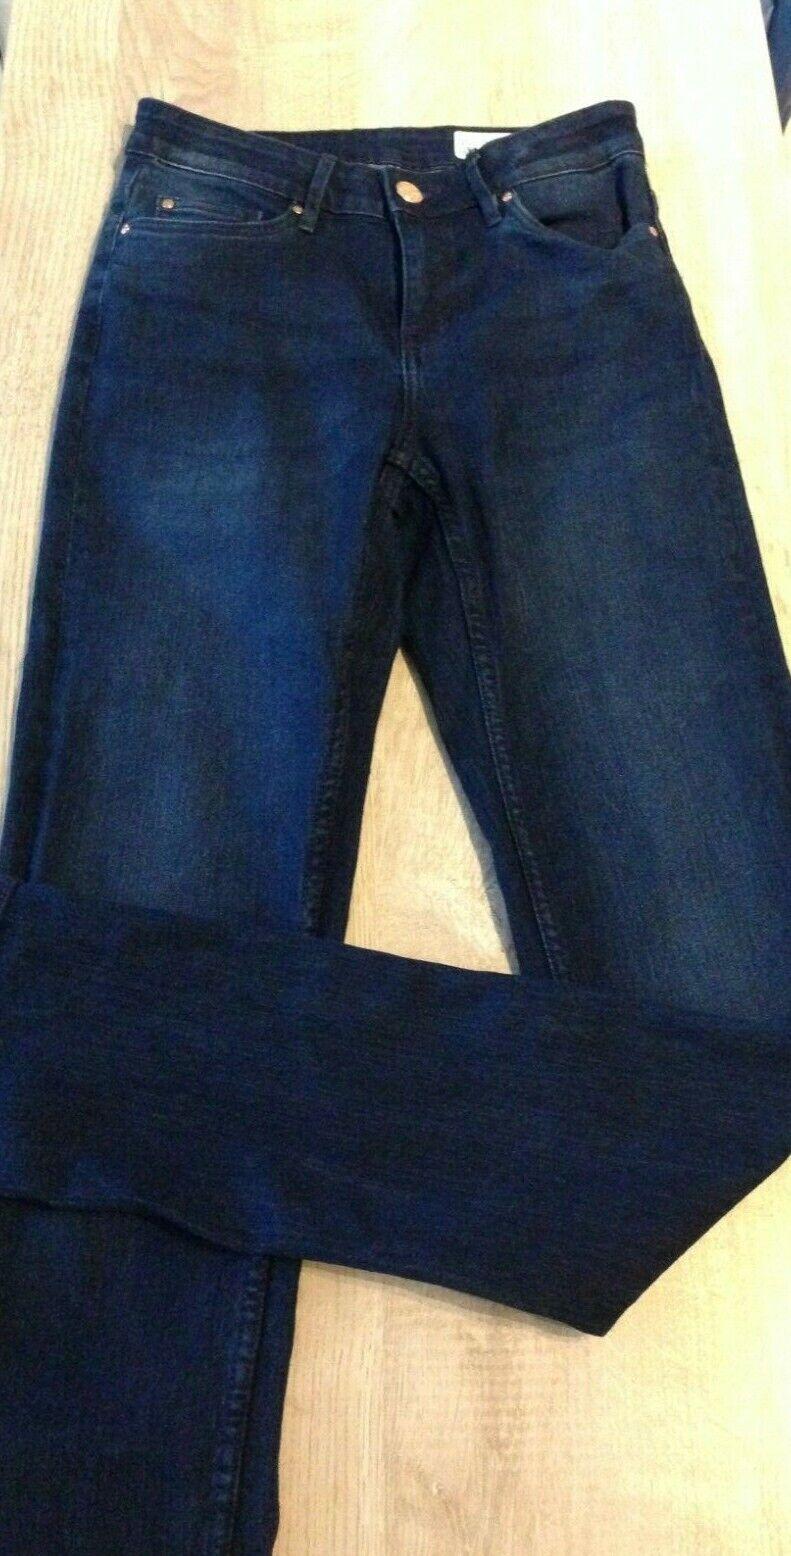 Jean skinny fit bleu foncé esmara taille 36 - exellent état